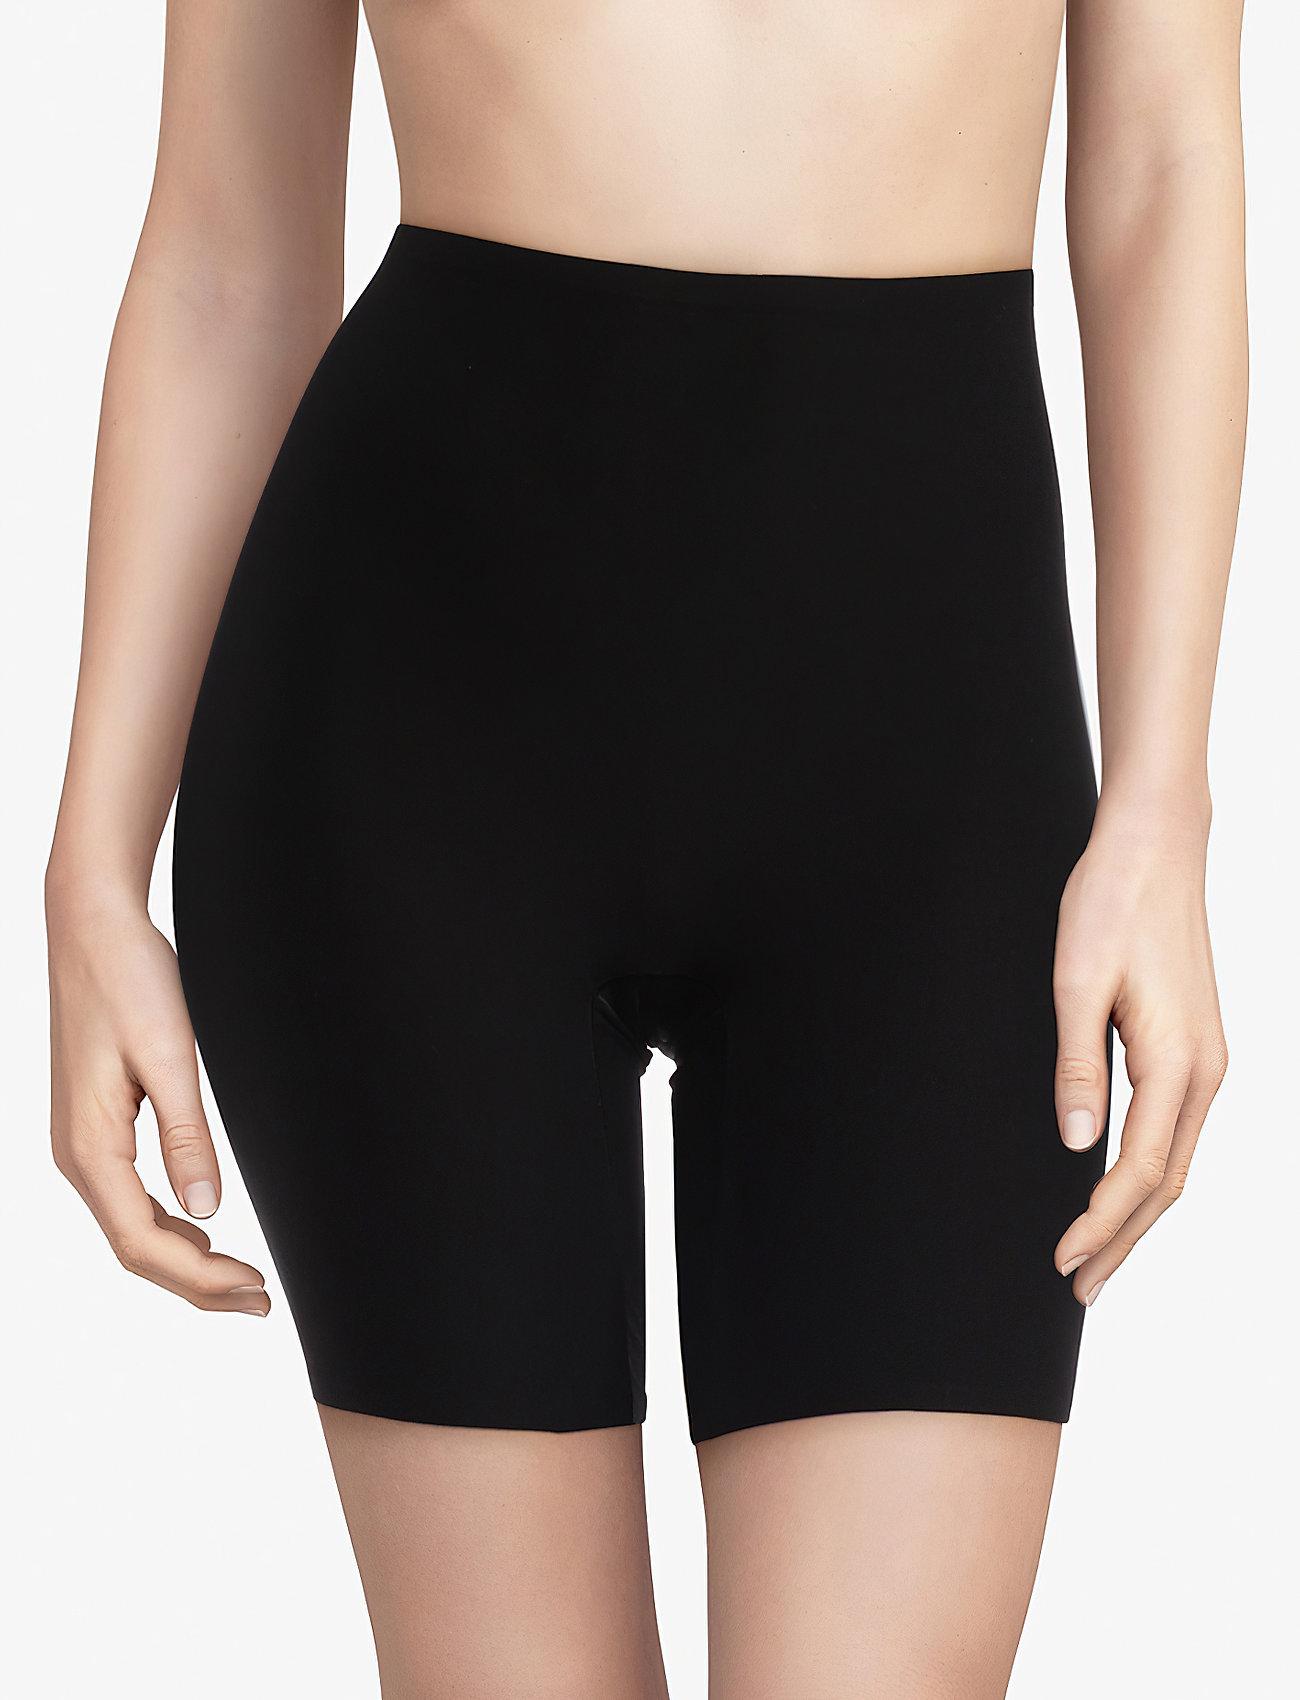 CHANTELLE - Soft Stretch High Waist Mid-Thigh Short - bottoms - black - 0